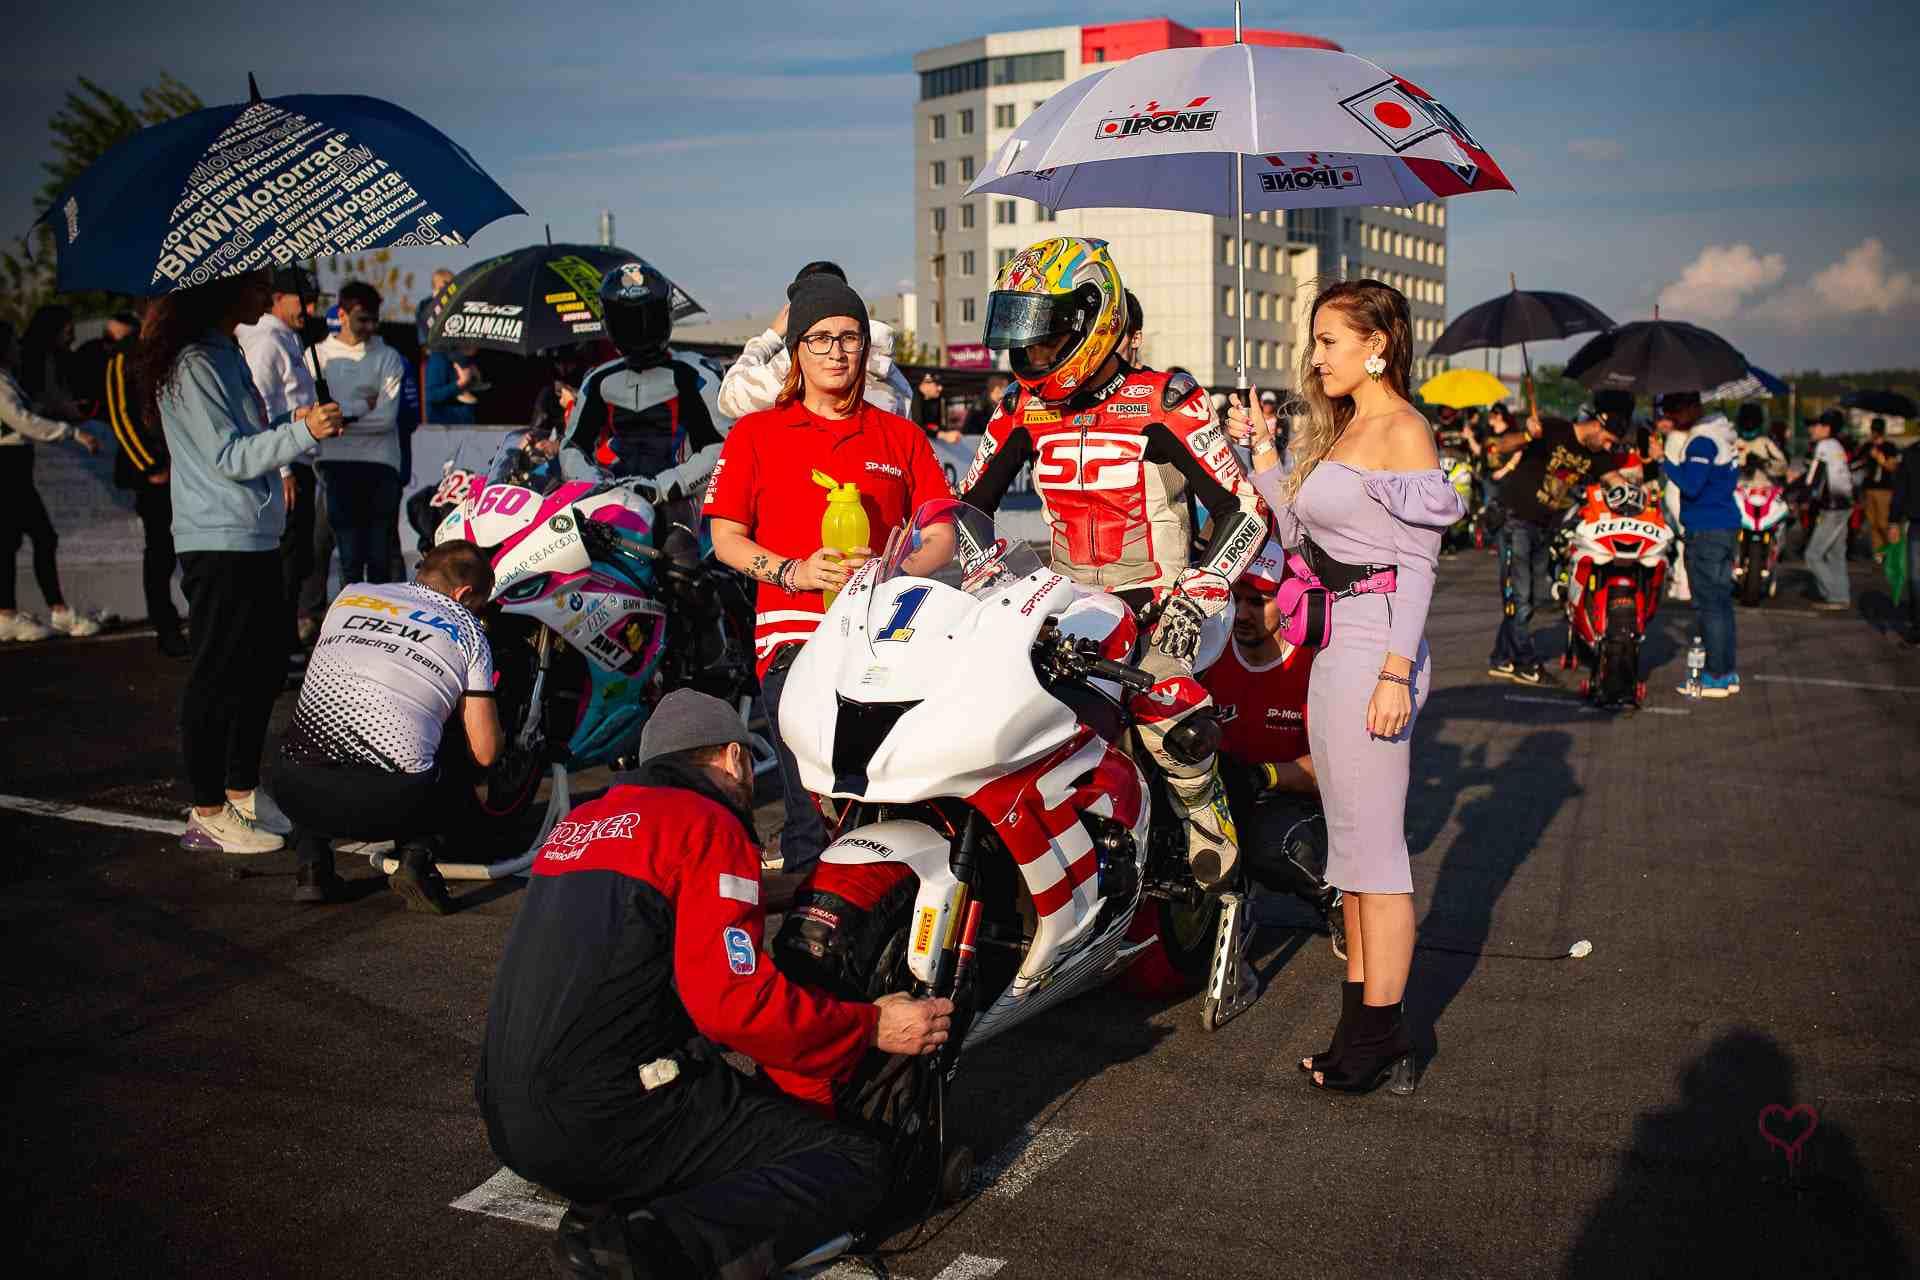 5-6_etap_MotoGPUkraine_068